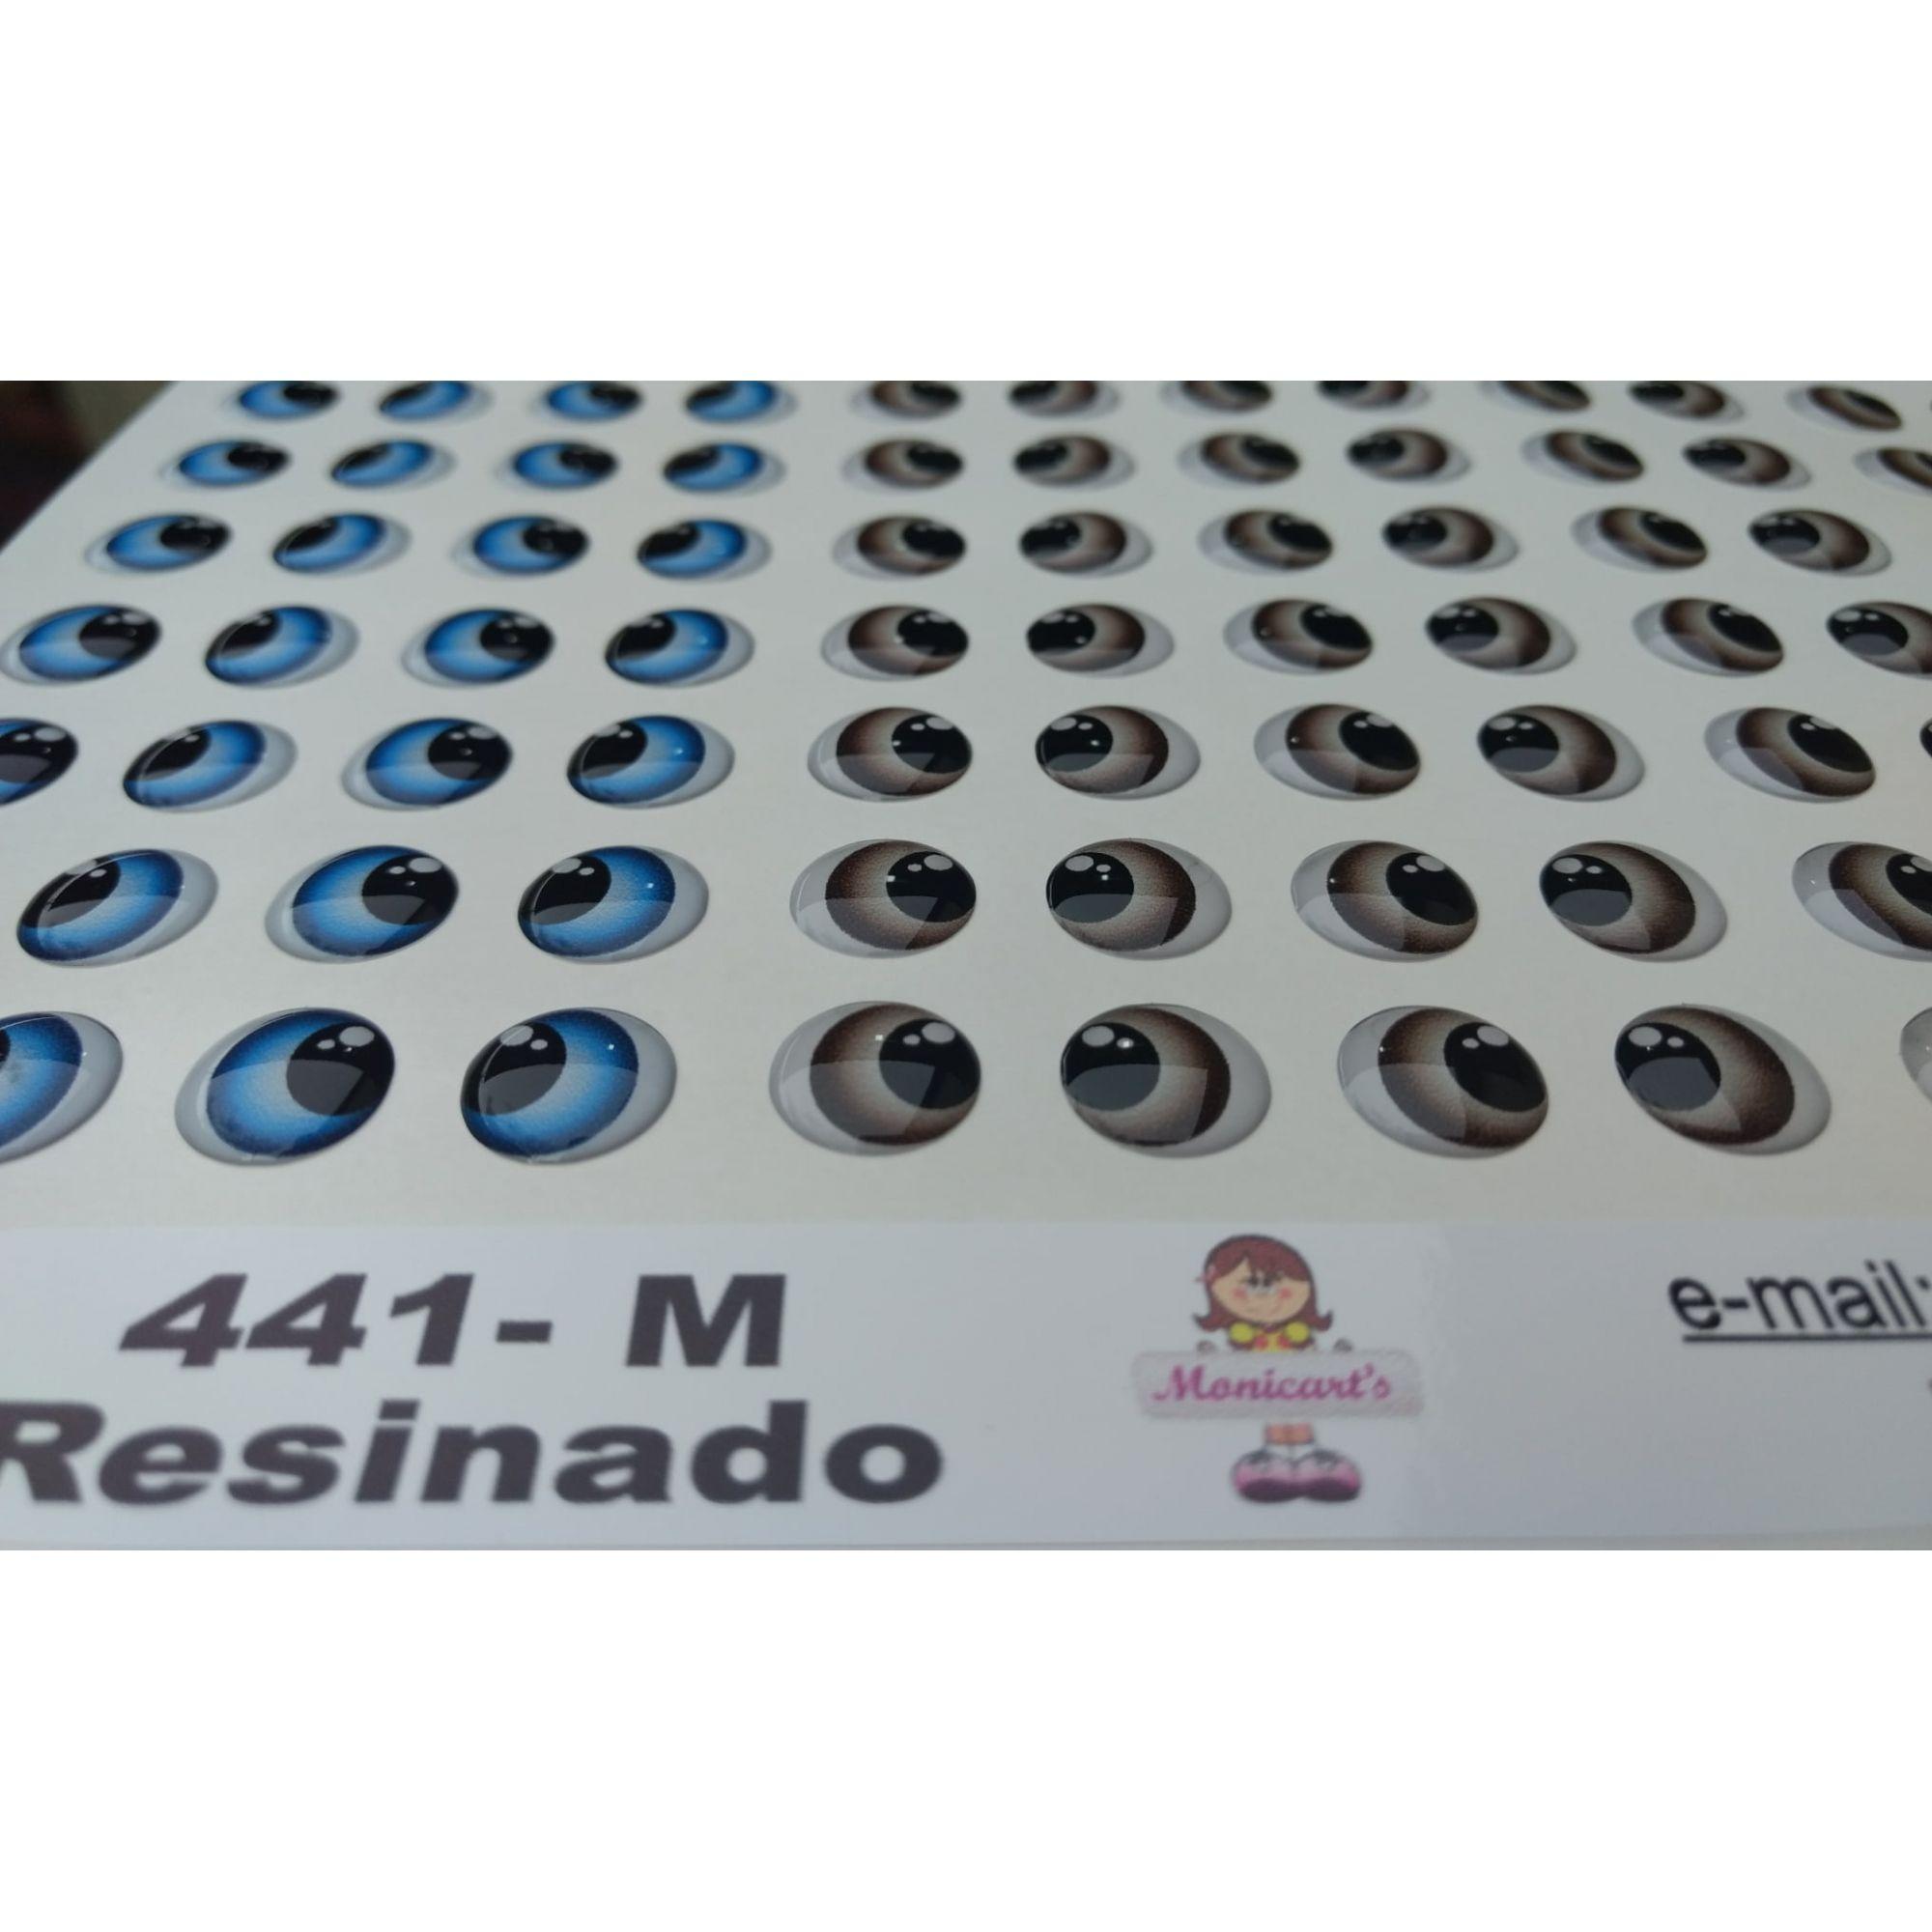 OLHOS ADESIVOS RESINADO 441 M